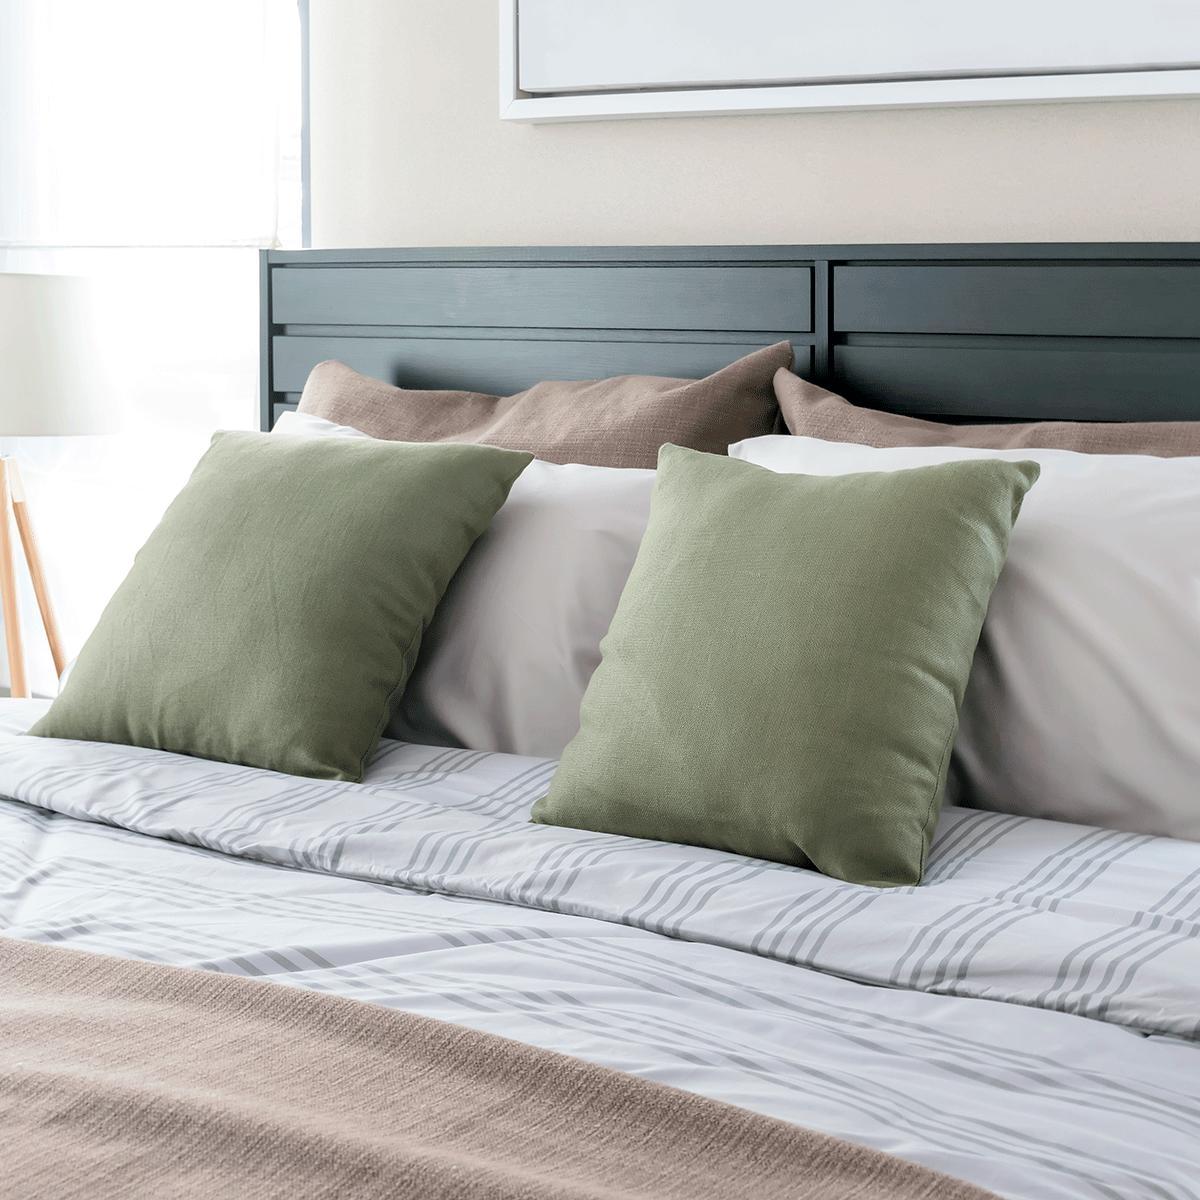 Seasonal bedding storage